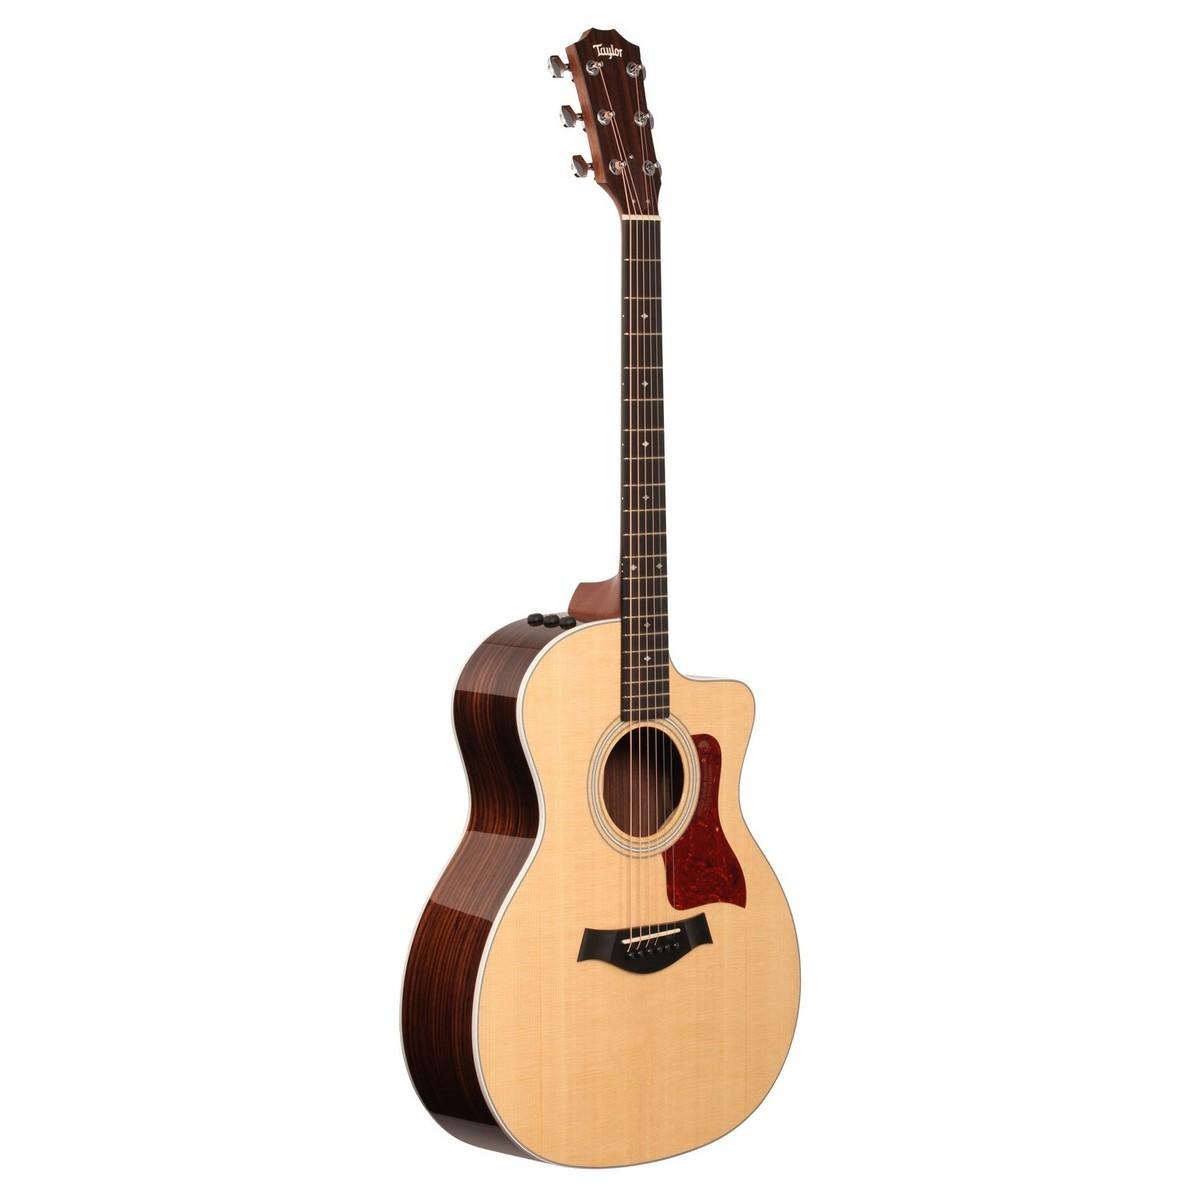 disc taylor 214ce dlx grand auditorium electro acoustic guitar 2015 at gear4music. Black Bedroom Furniture Sets. Home Design Ideas